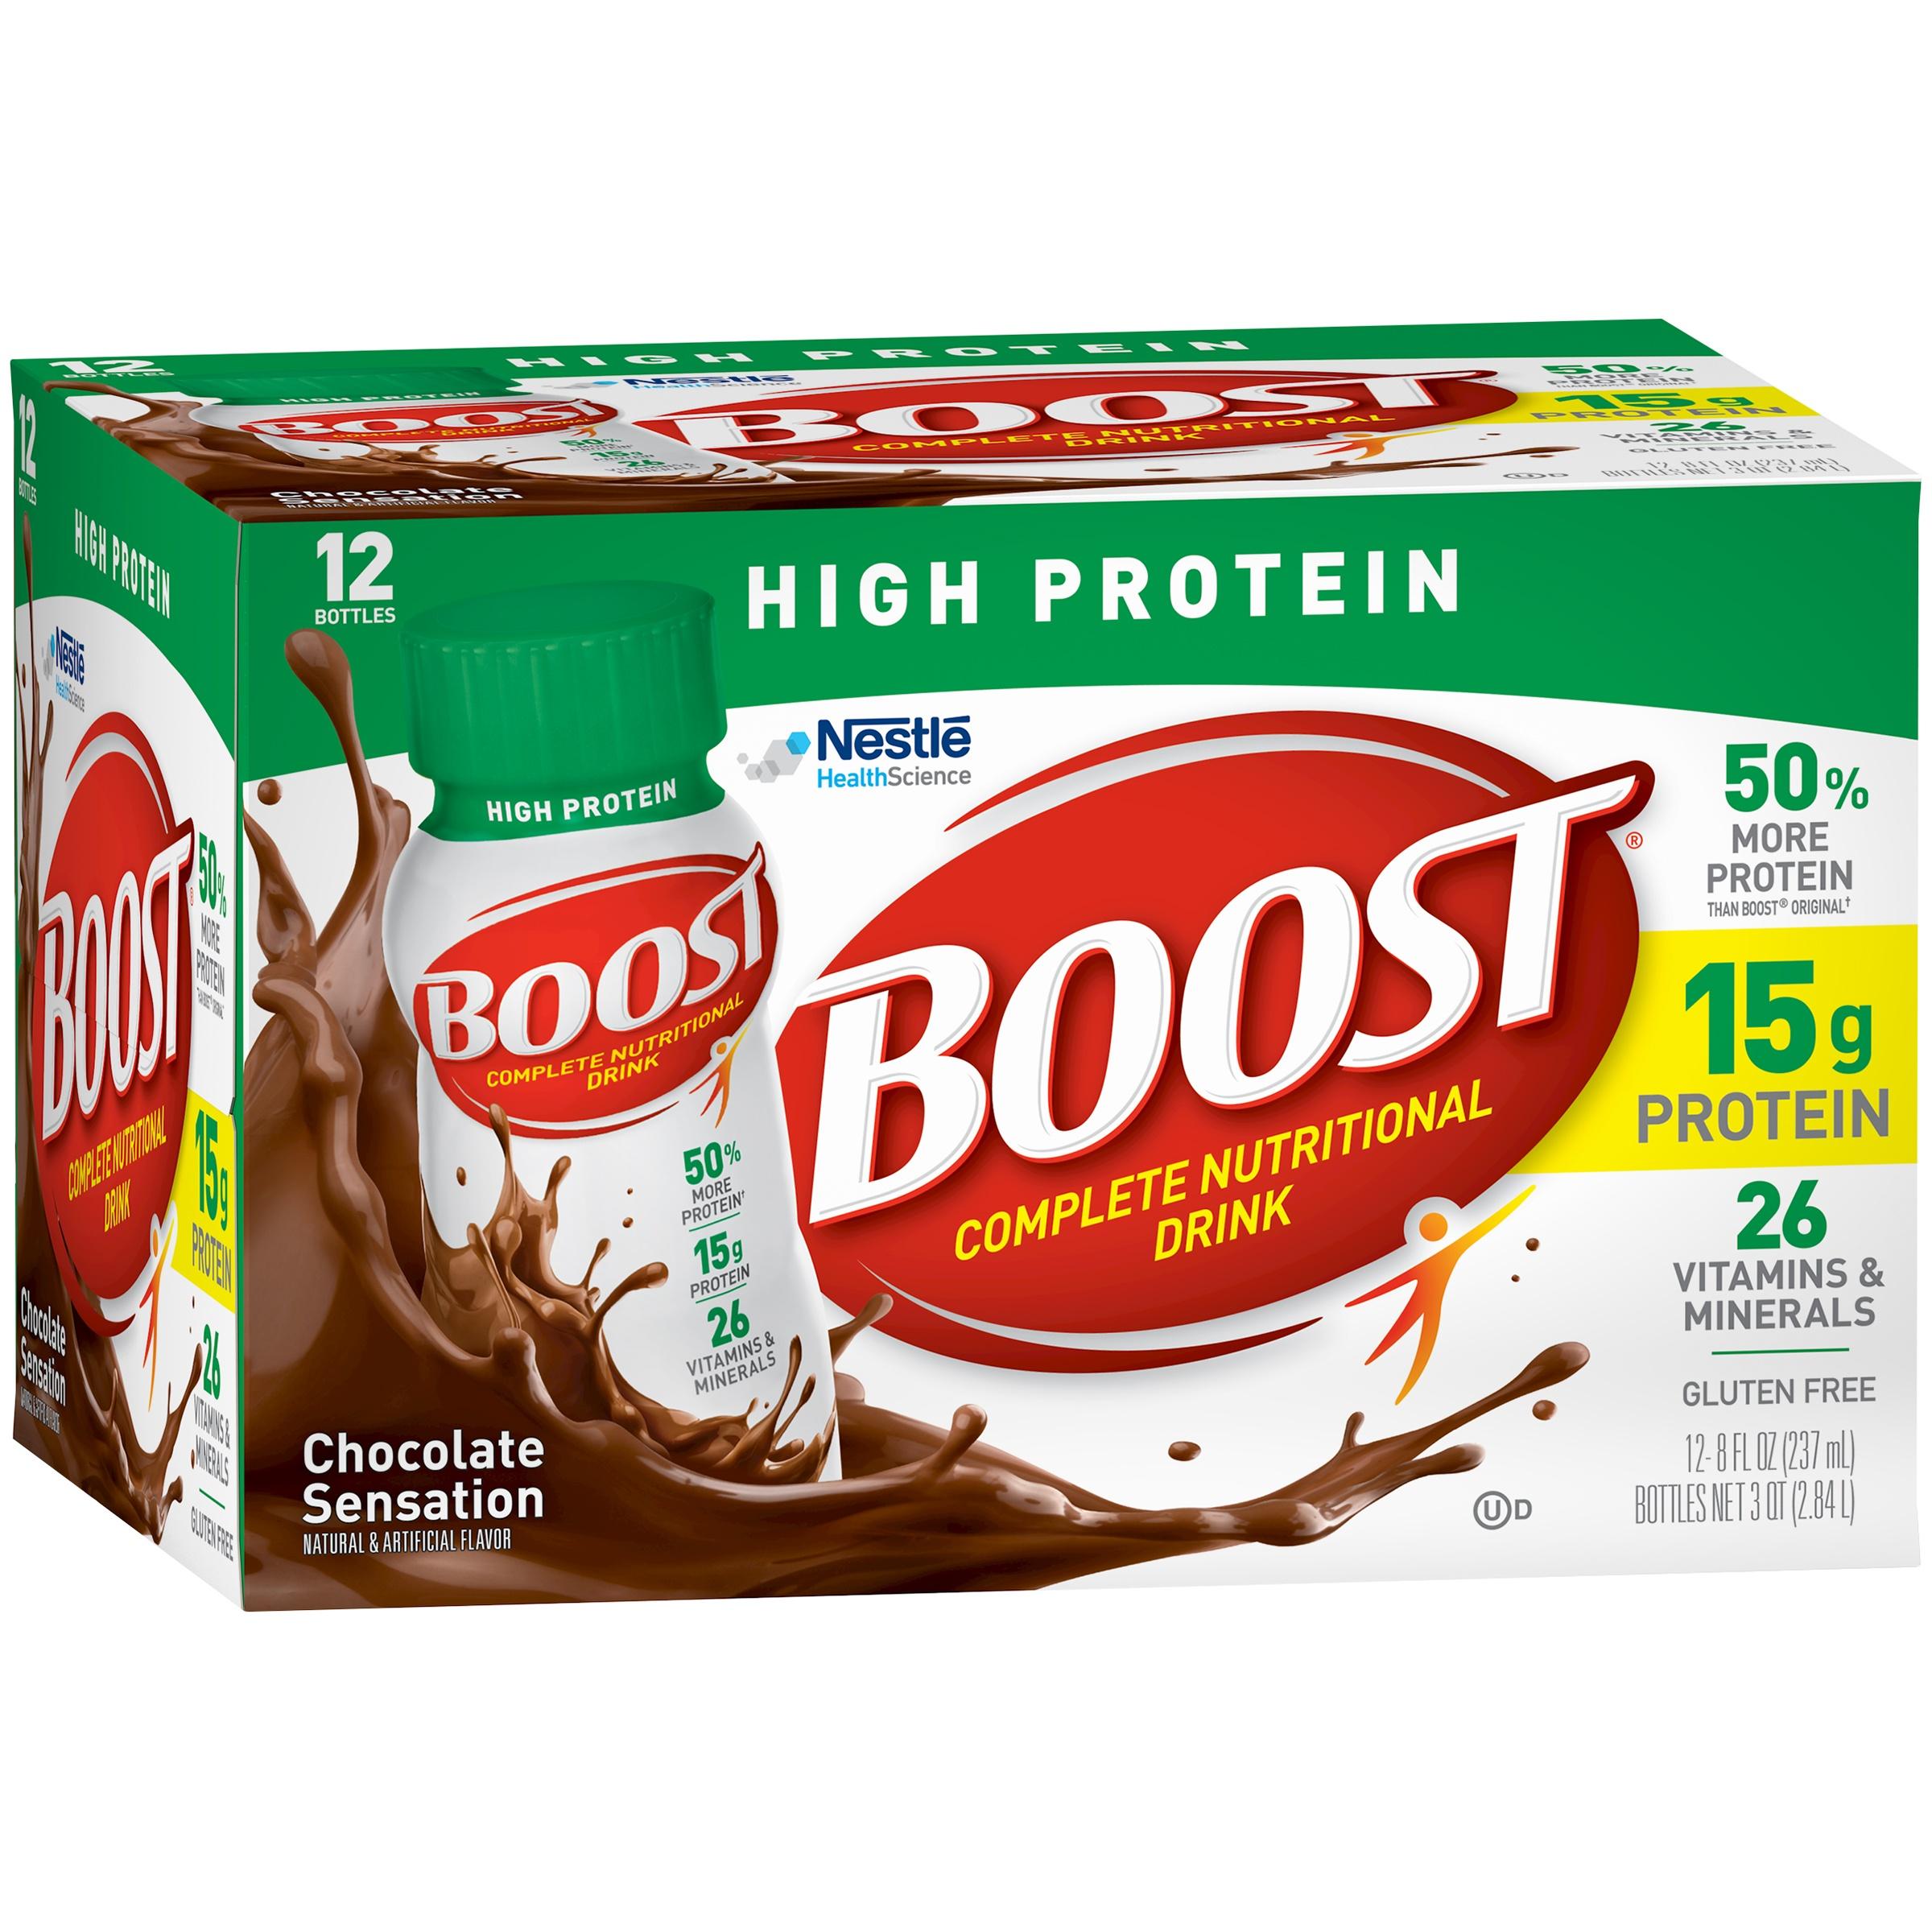 BOOST HIGH PROTEIN Complete Nutritional Drink,  Chocolate Sensation, 8 fl oz Bottle, 12 Pack